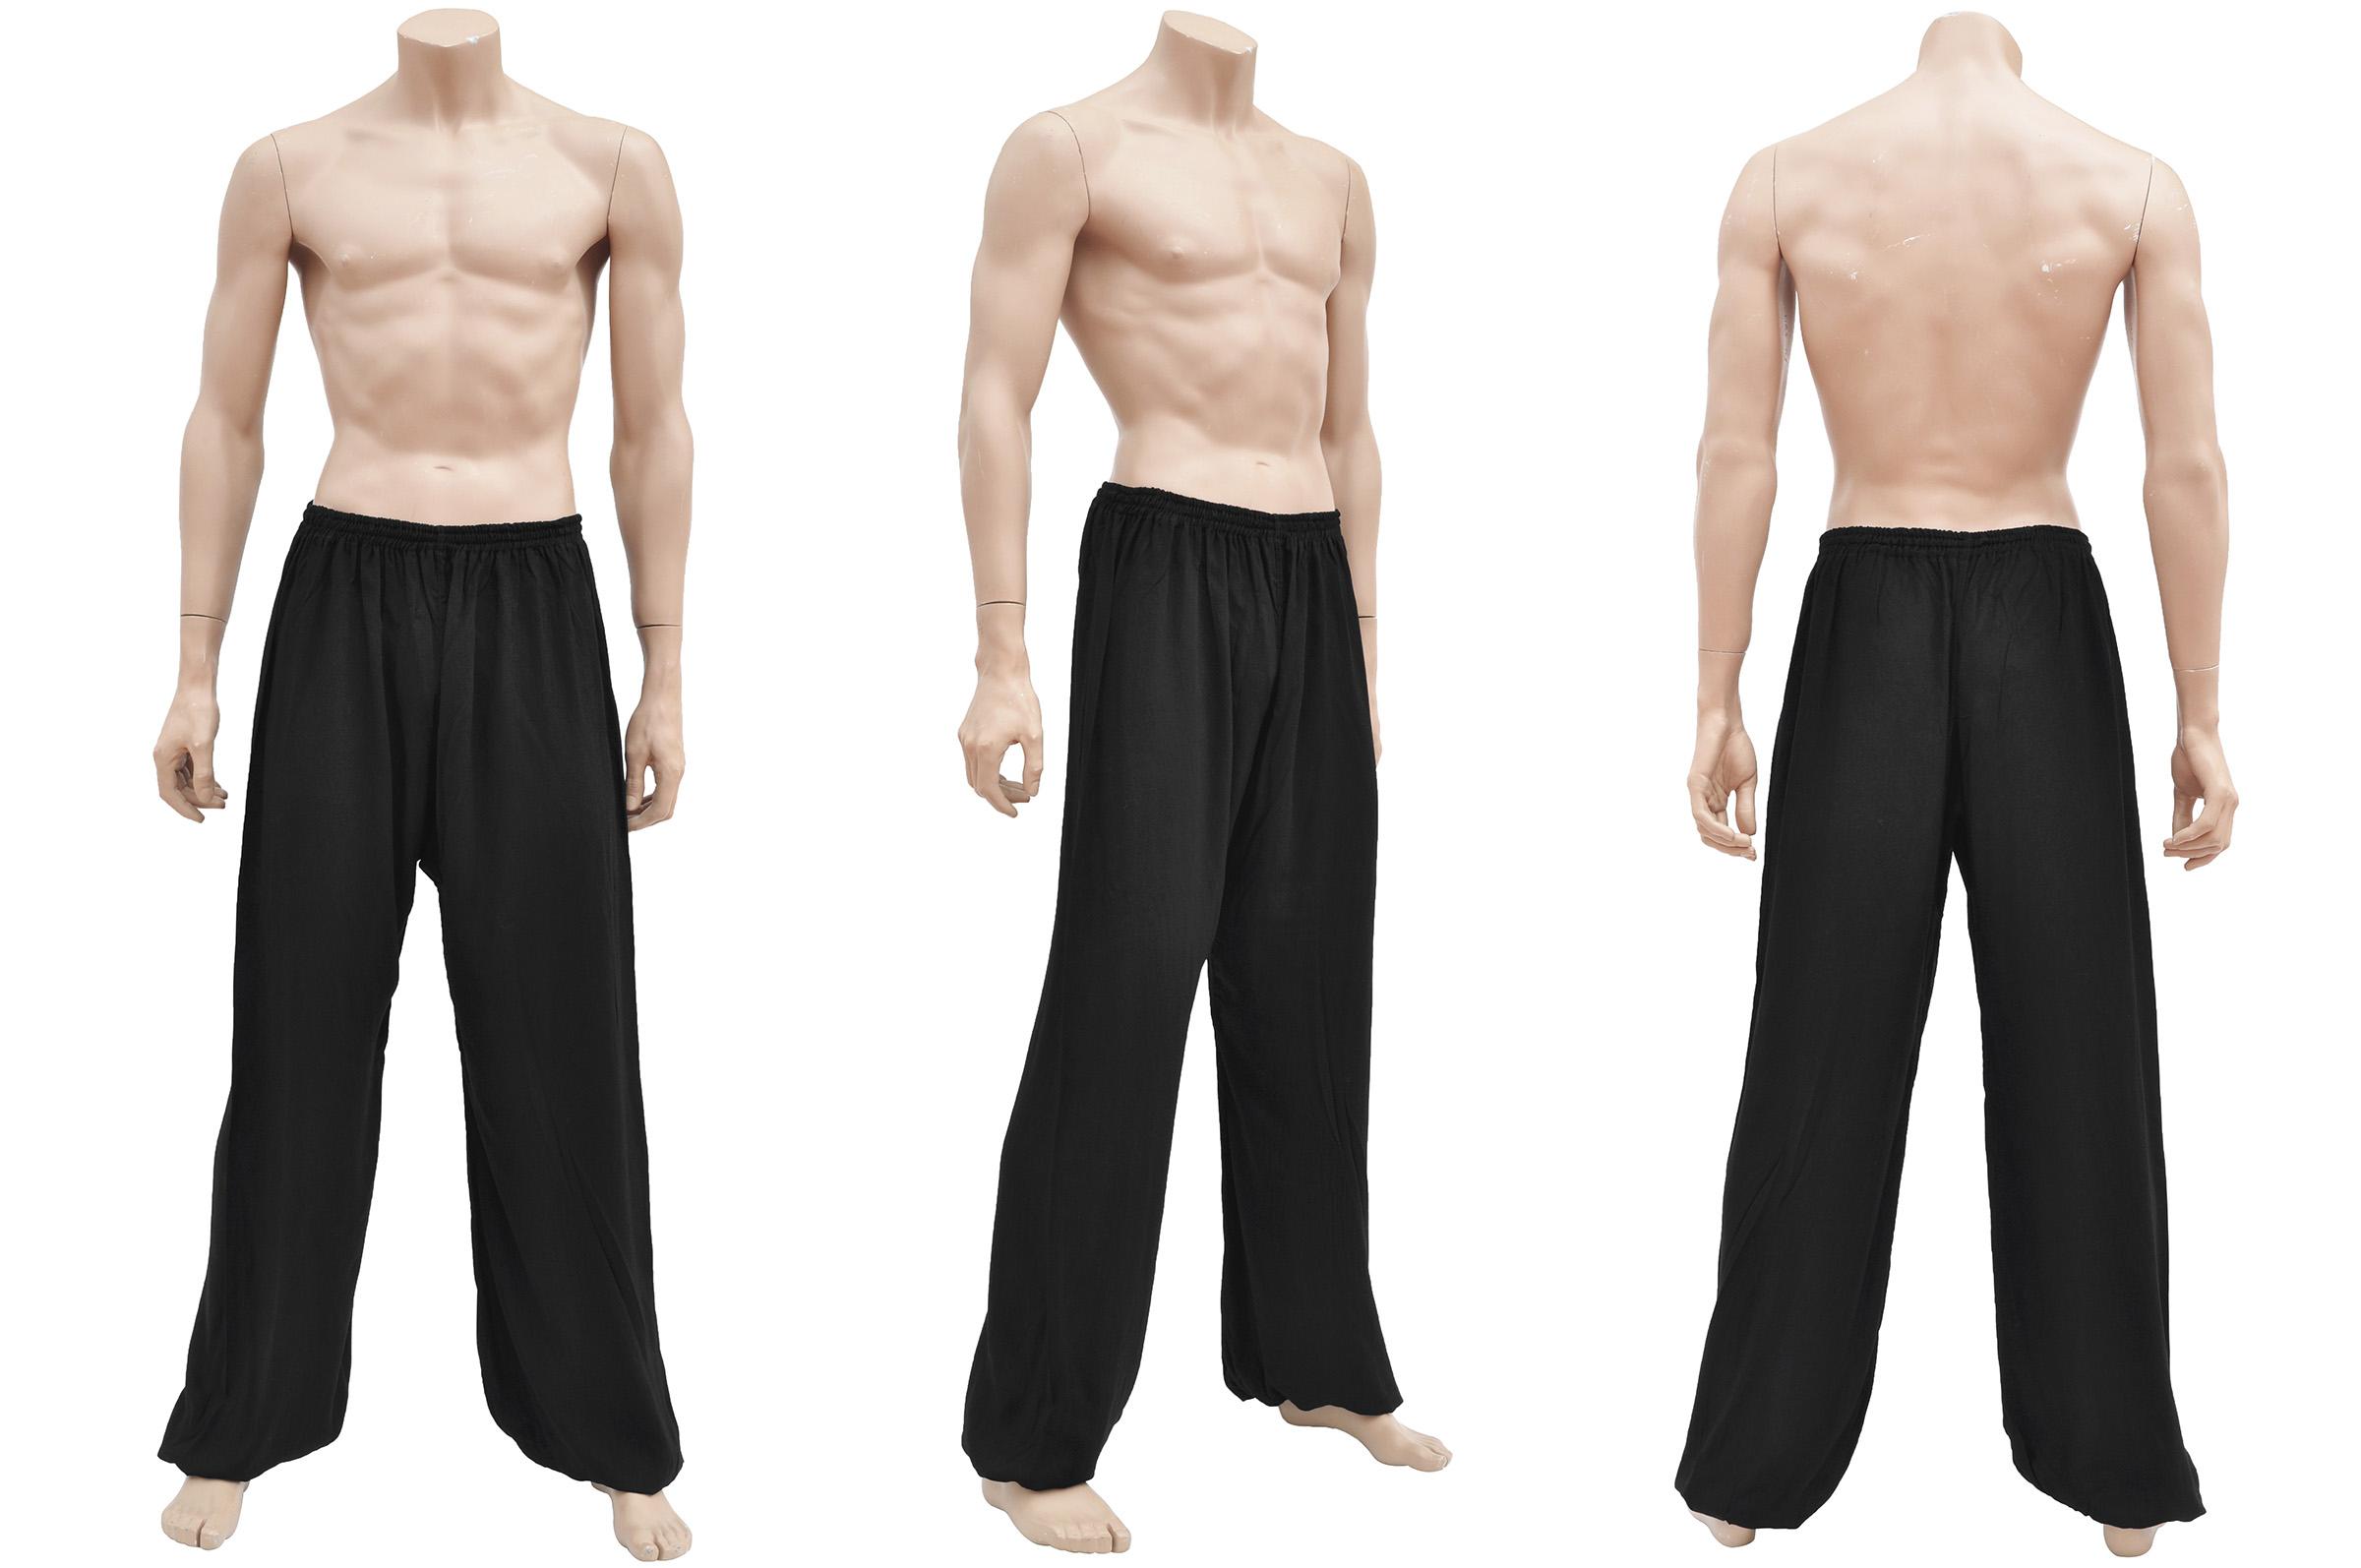 Kung-fu, Wushu Pants, Viscose+Cotton, Black - DragonSports.eu